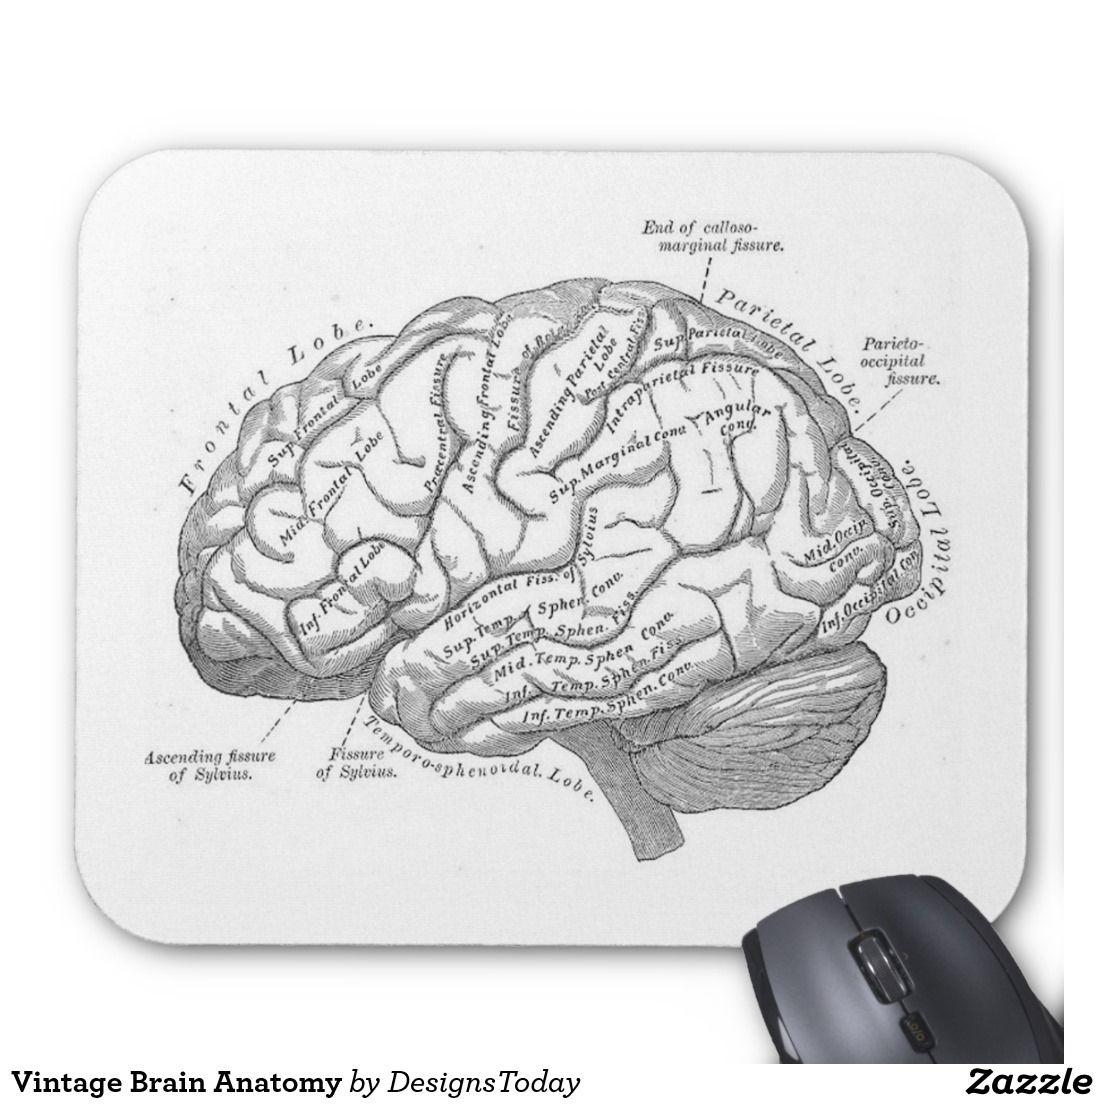 Vintage Brain Anatomy Mouse Pad | Office Stuff | Pinterest | Brain ...